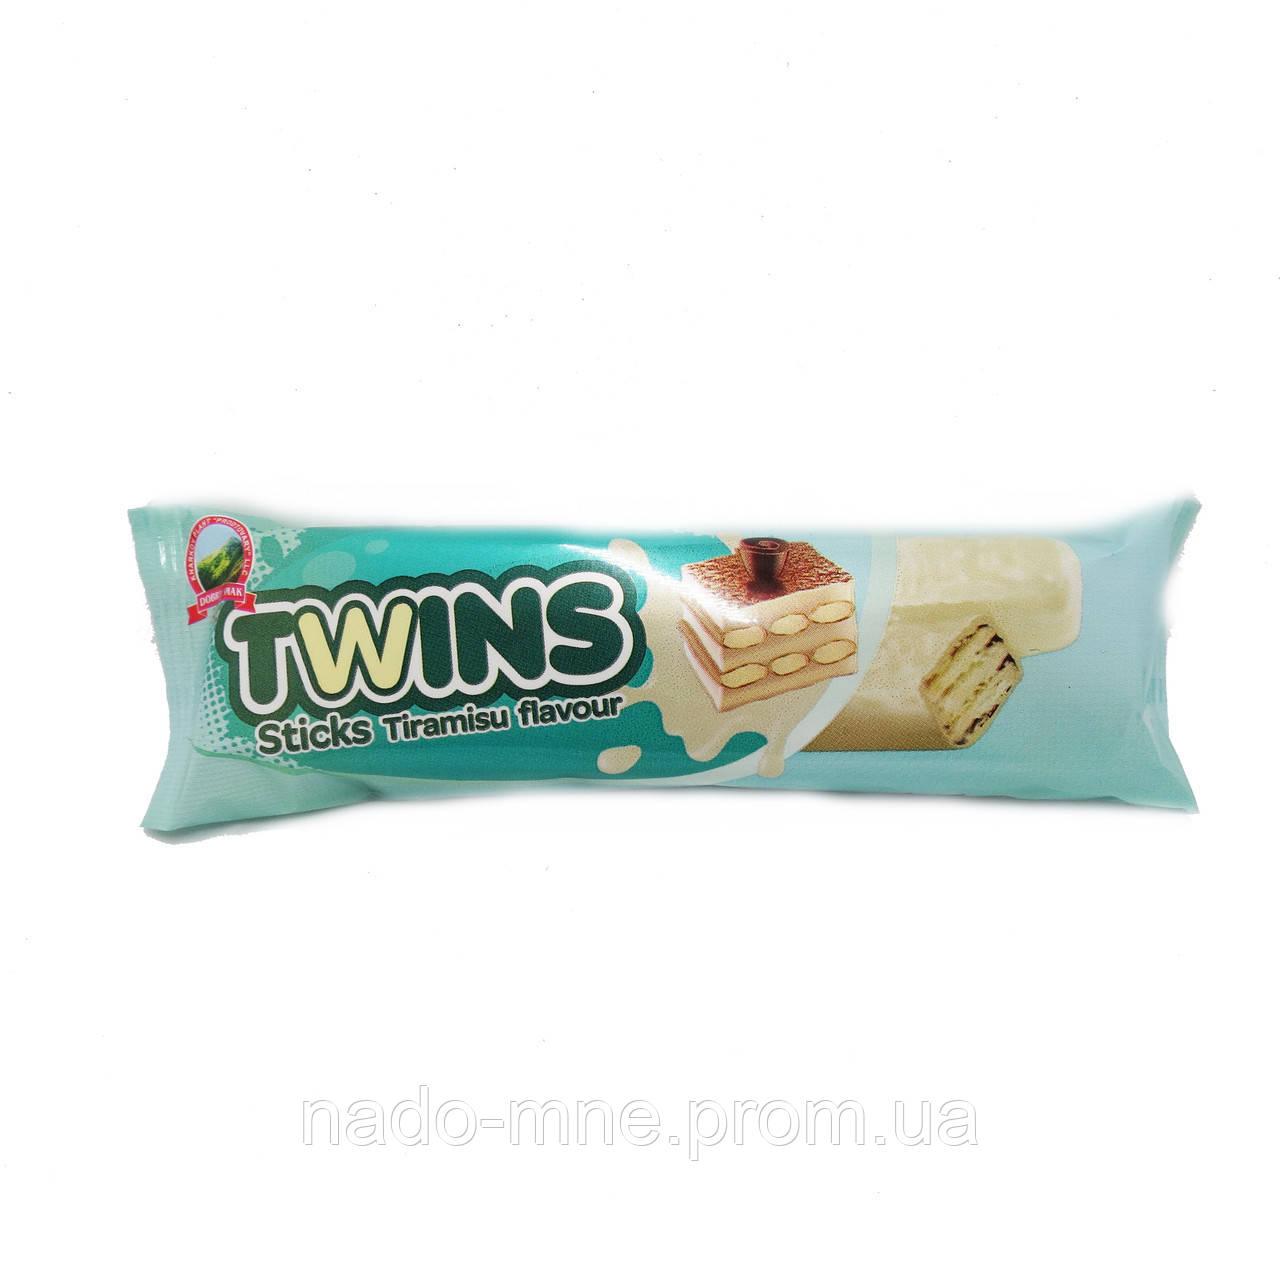 Вафли twins со вкусом тирамису в белой глазури